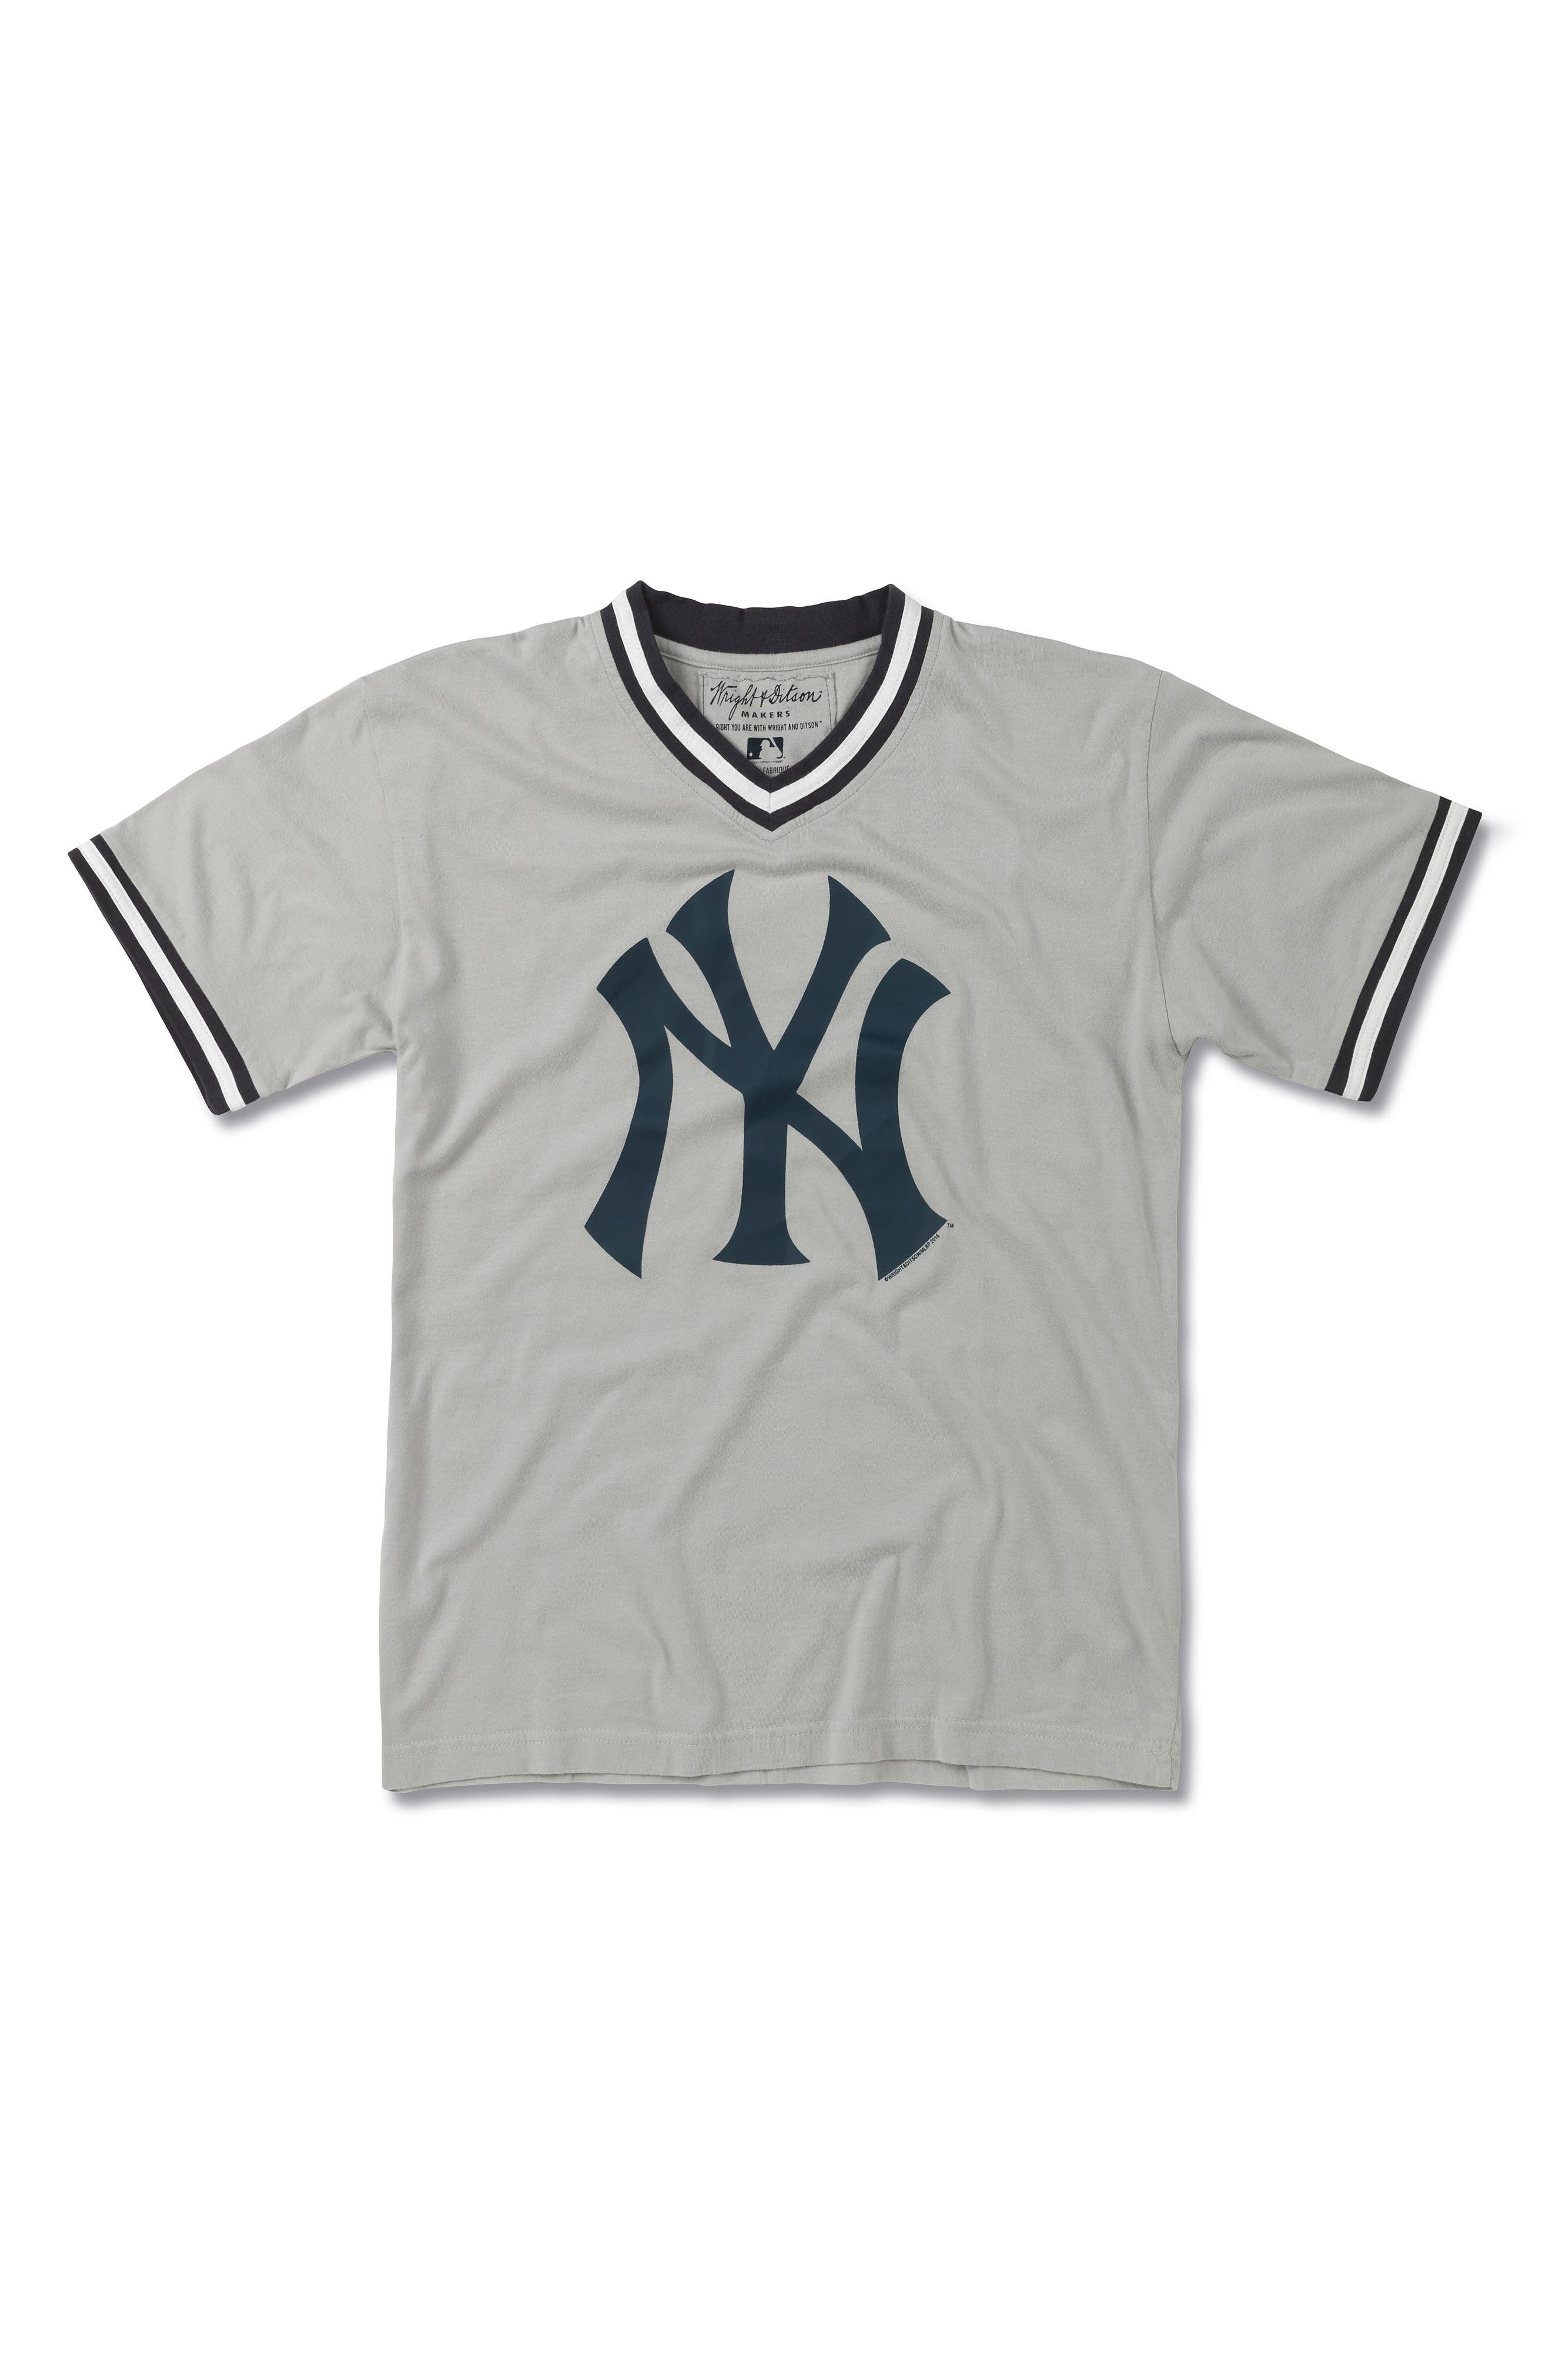 Alternate Image 1 Selected - Wright & Ditson New York Yankees T-Shirt (Little Boys & Big Boys)